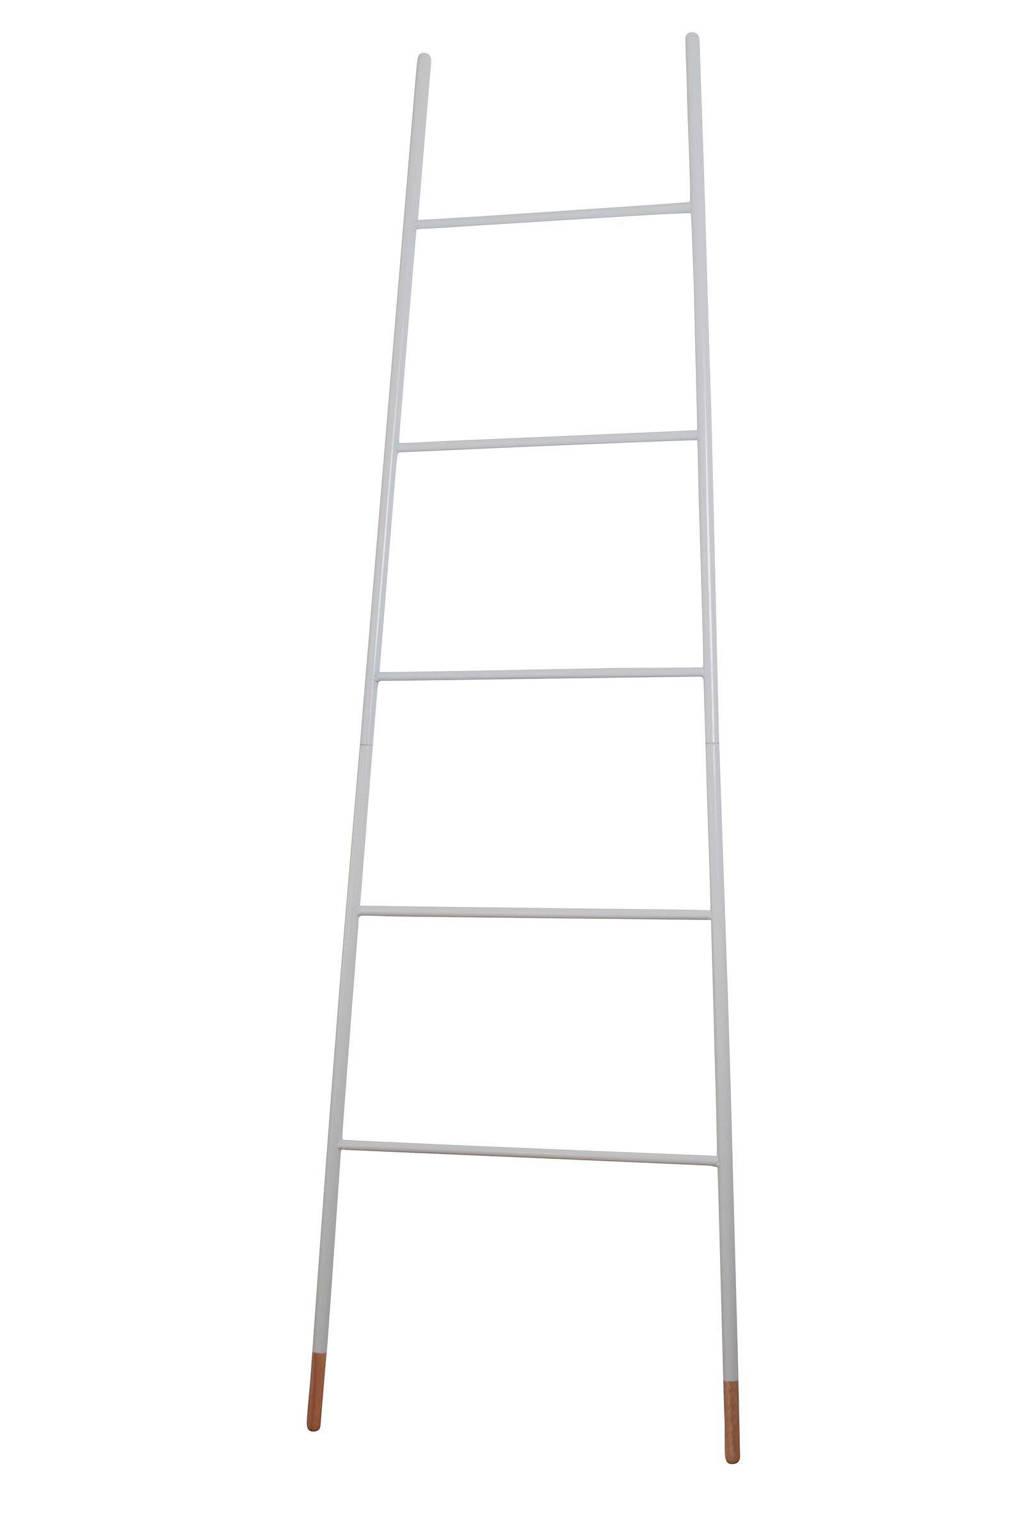 Robuuste Houten Ladder.Zuiver Rack Ladder Decoratie Wehkamp